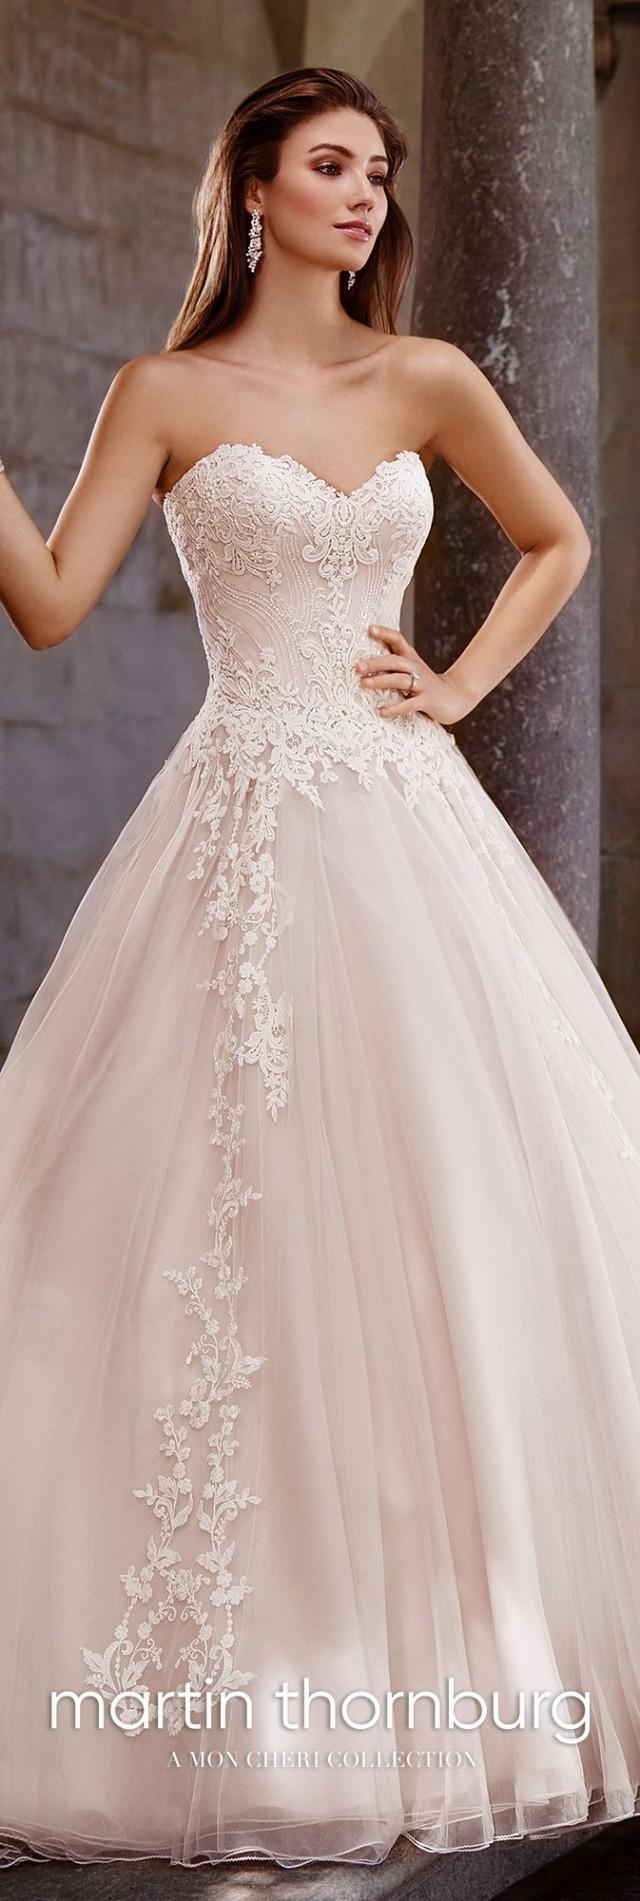 Lace A-Line Sweetheart Neckline Wedding Dress- 117267 Topaz